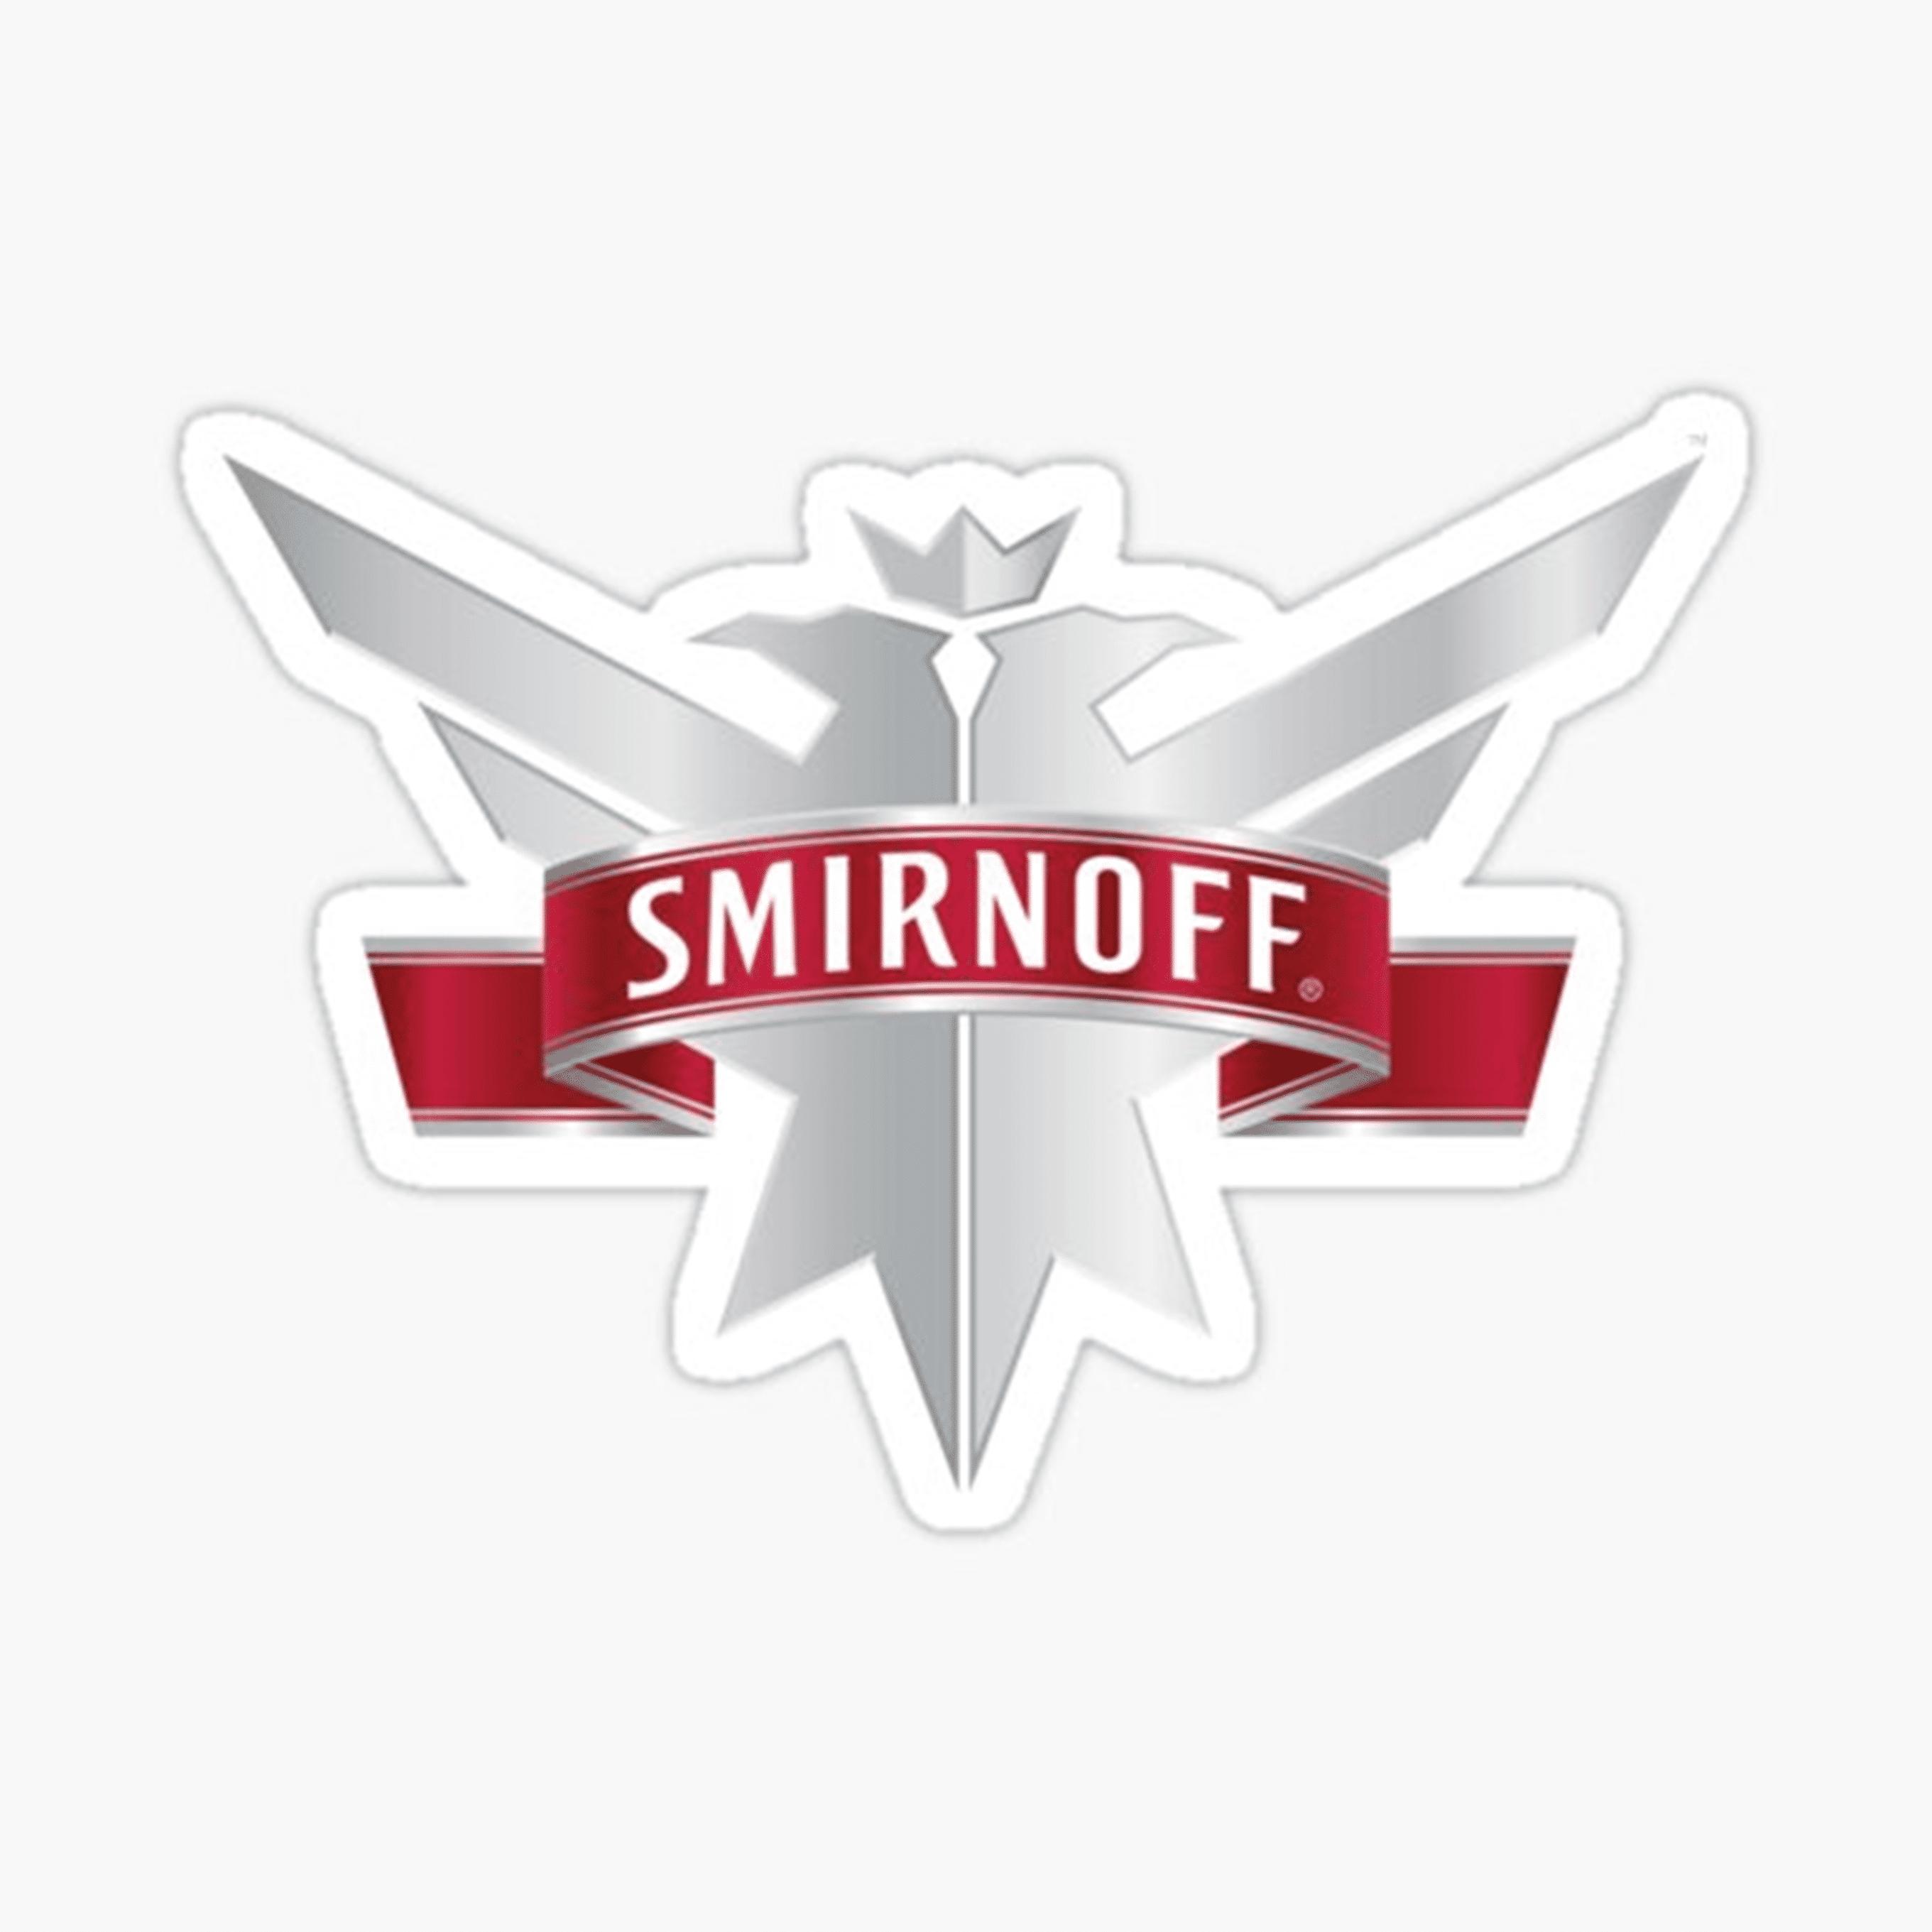 smirnoff-red